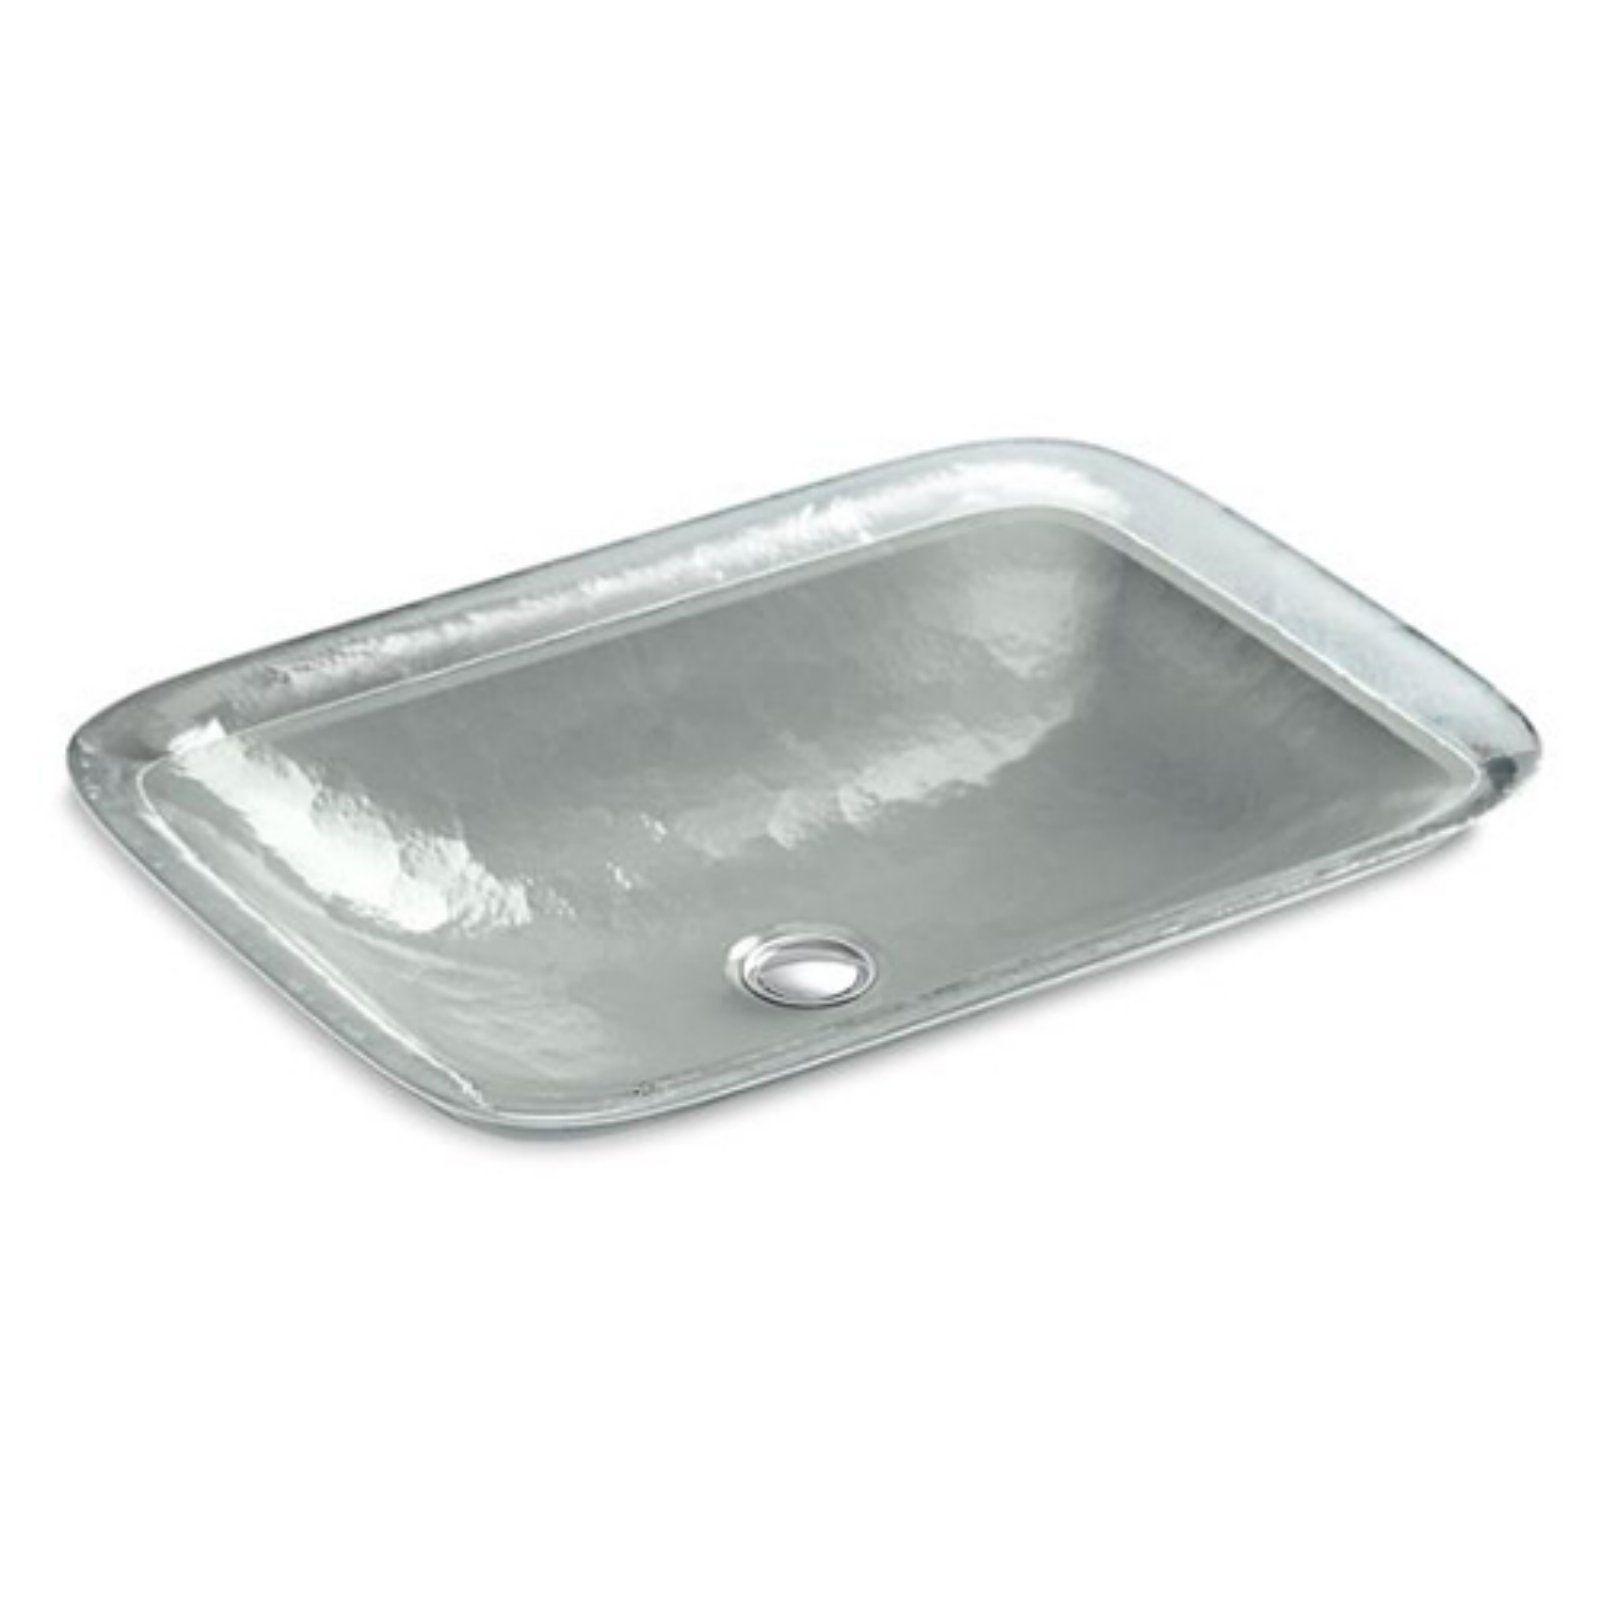 Kohler Inia K2773 Wading Pool Glass Vessel Bathroom Sink Opaque